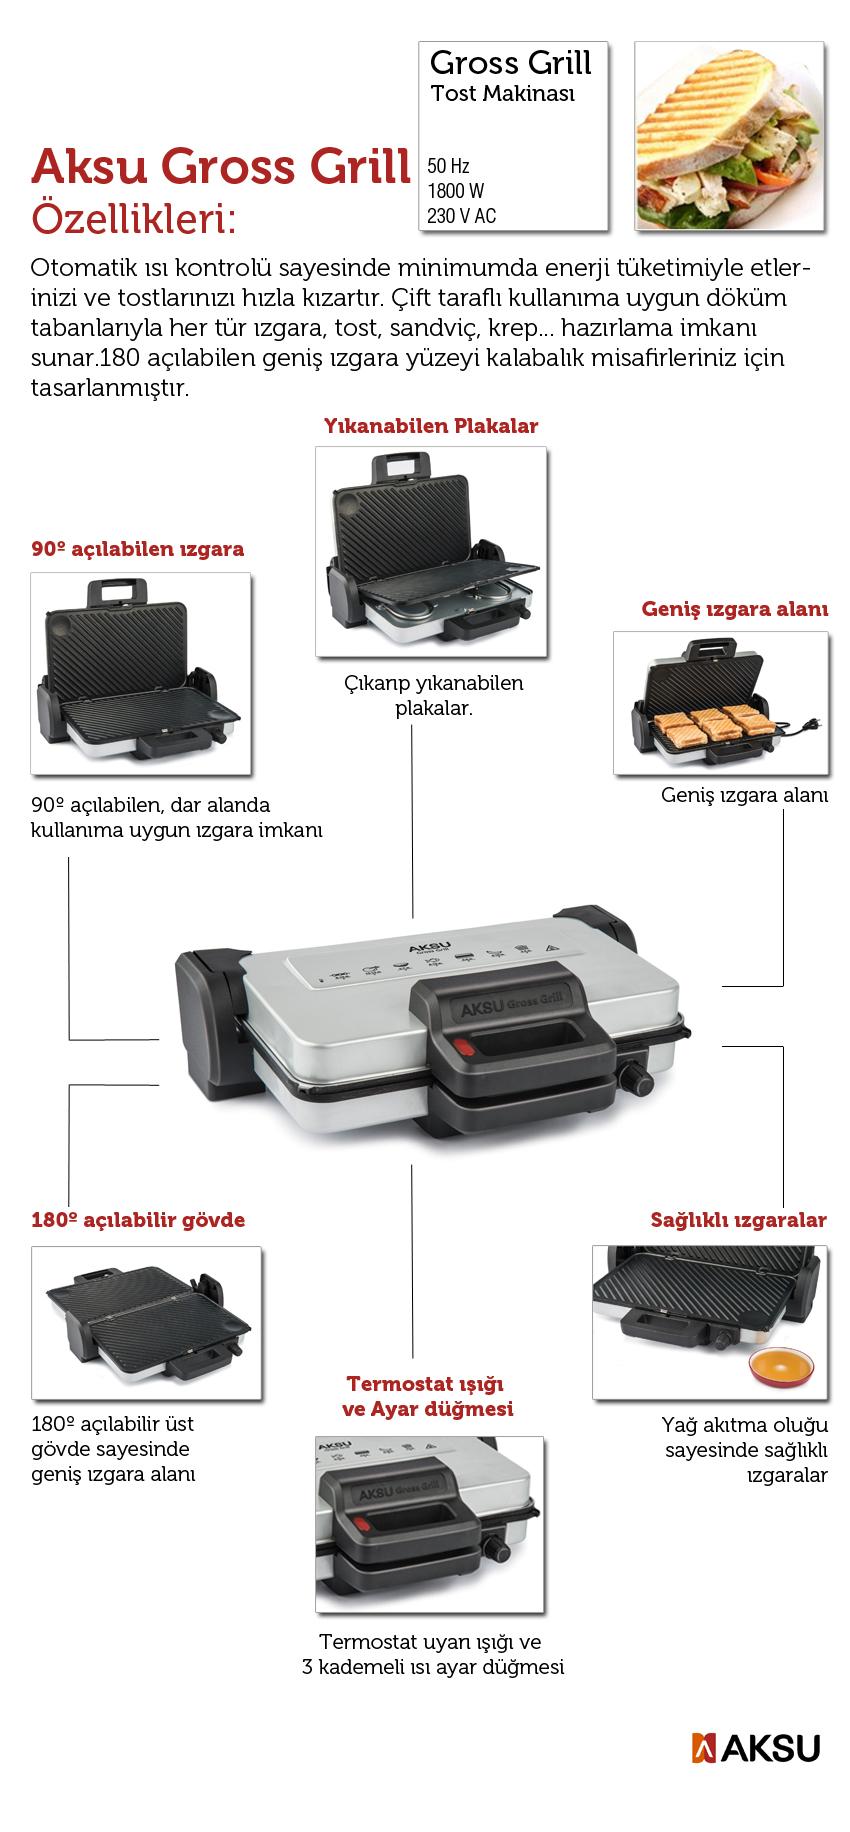 aksu t32 yeni gross grill tost makinası Aksu T 32 Gross Grill Izgara Ve Tost Makinesi Grill